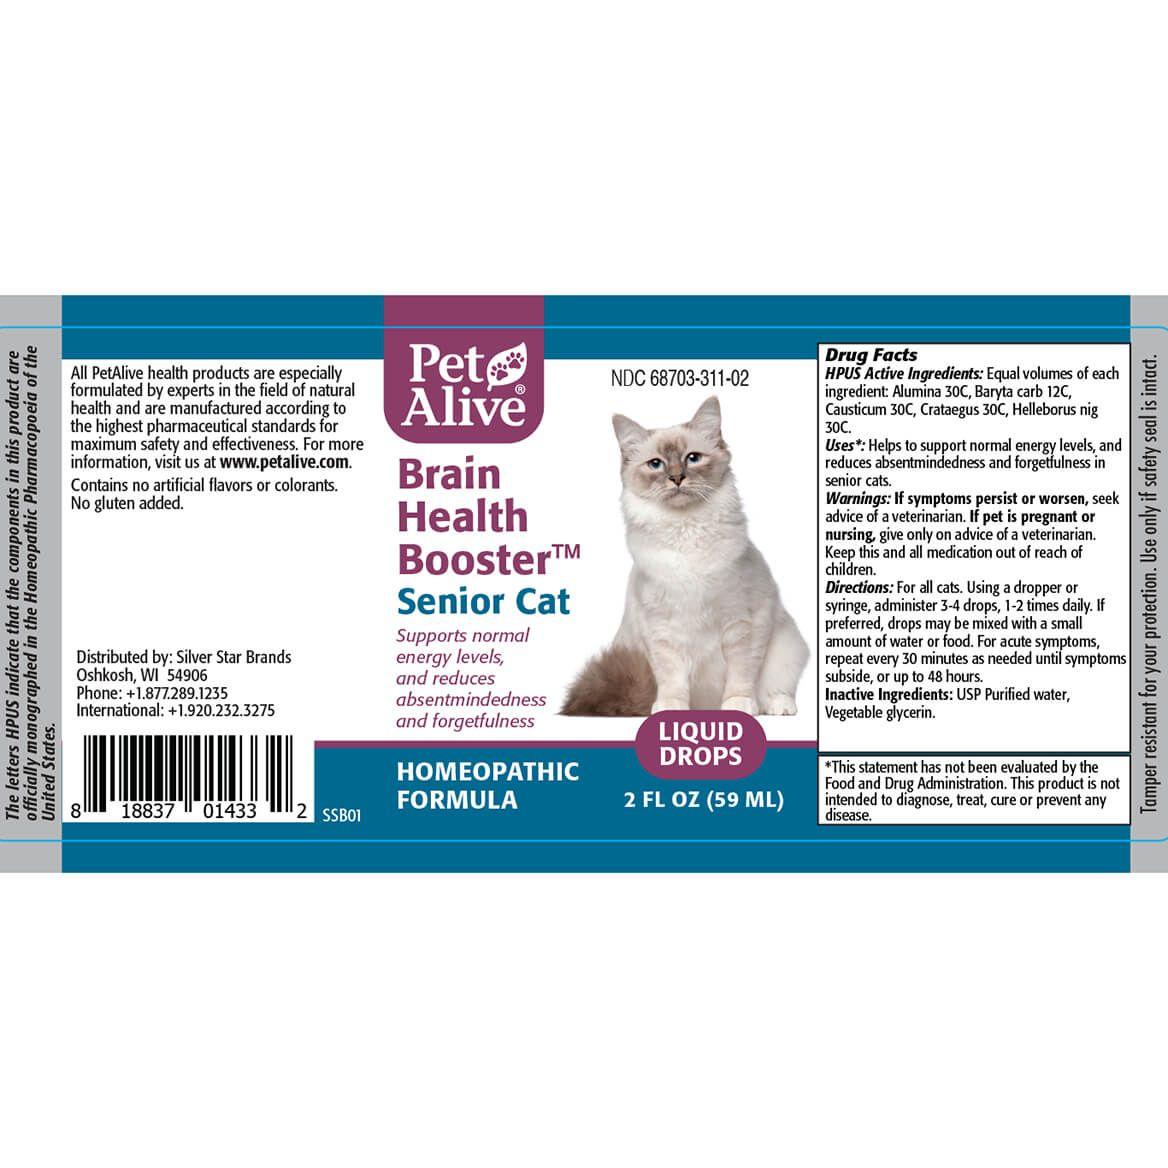 Brain Health Booster for Senior Cats™-362895